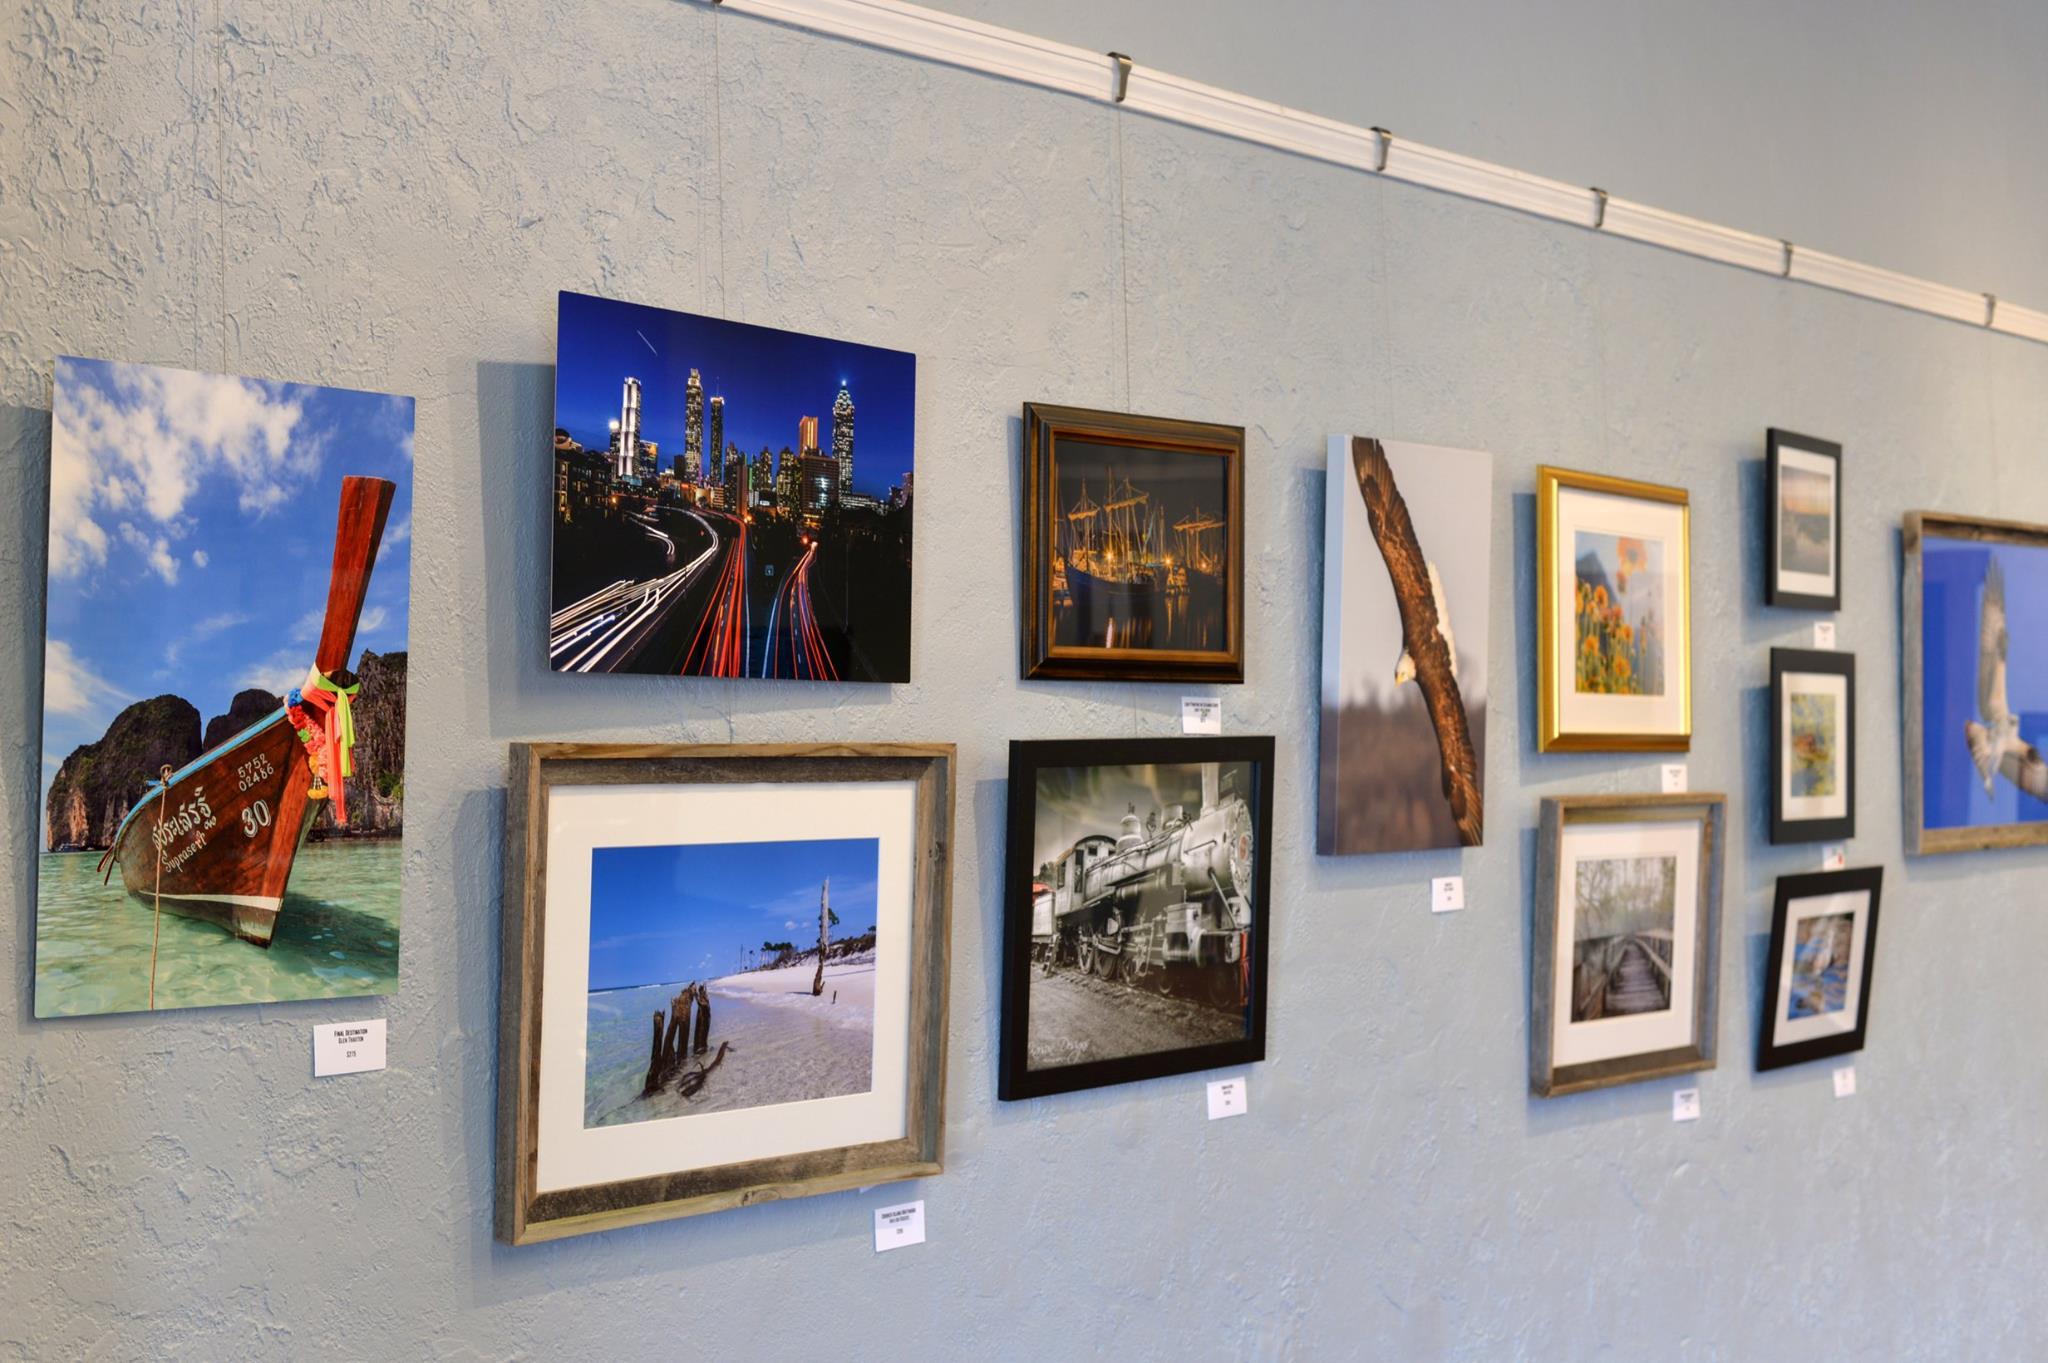 panama city photogrpahy club show blue wall.jpg